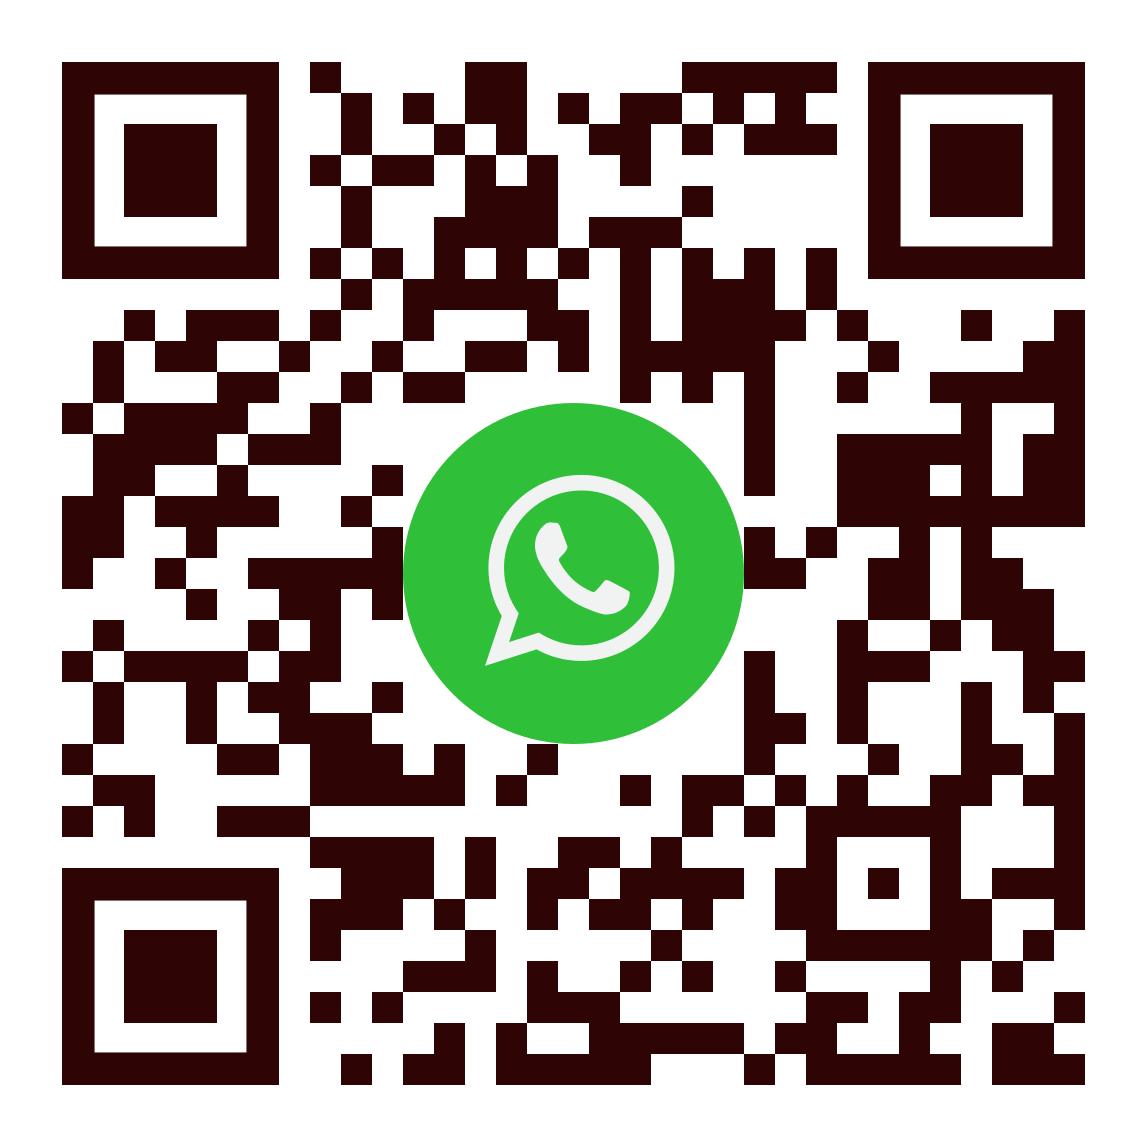 whatsapp-qr-code.png